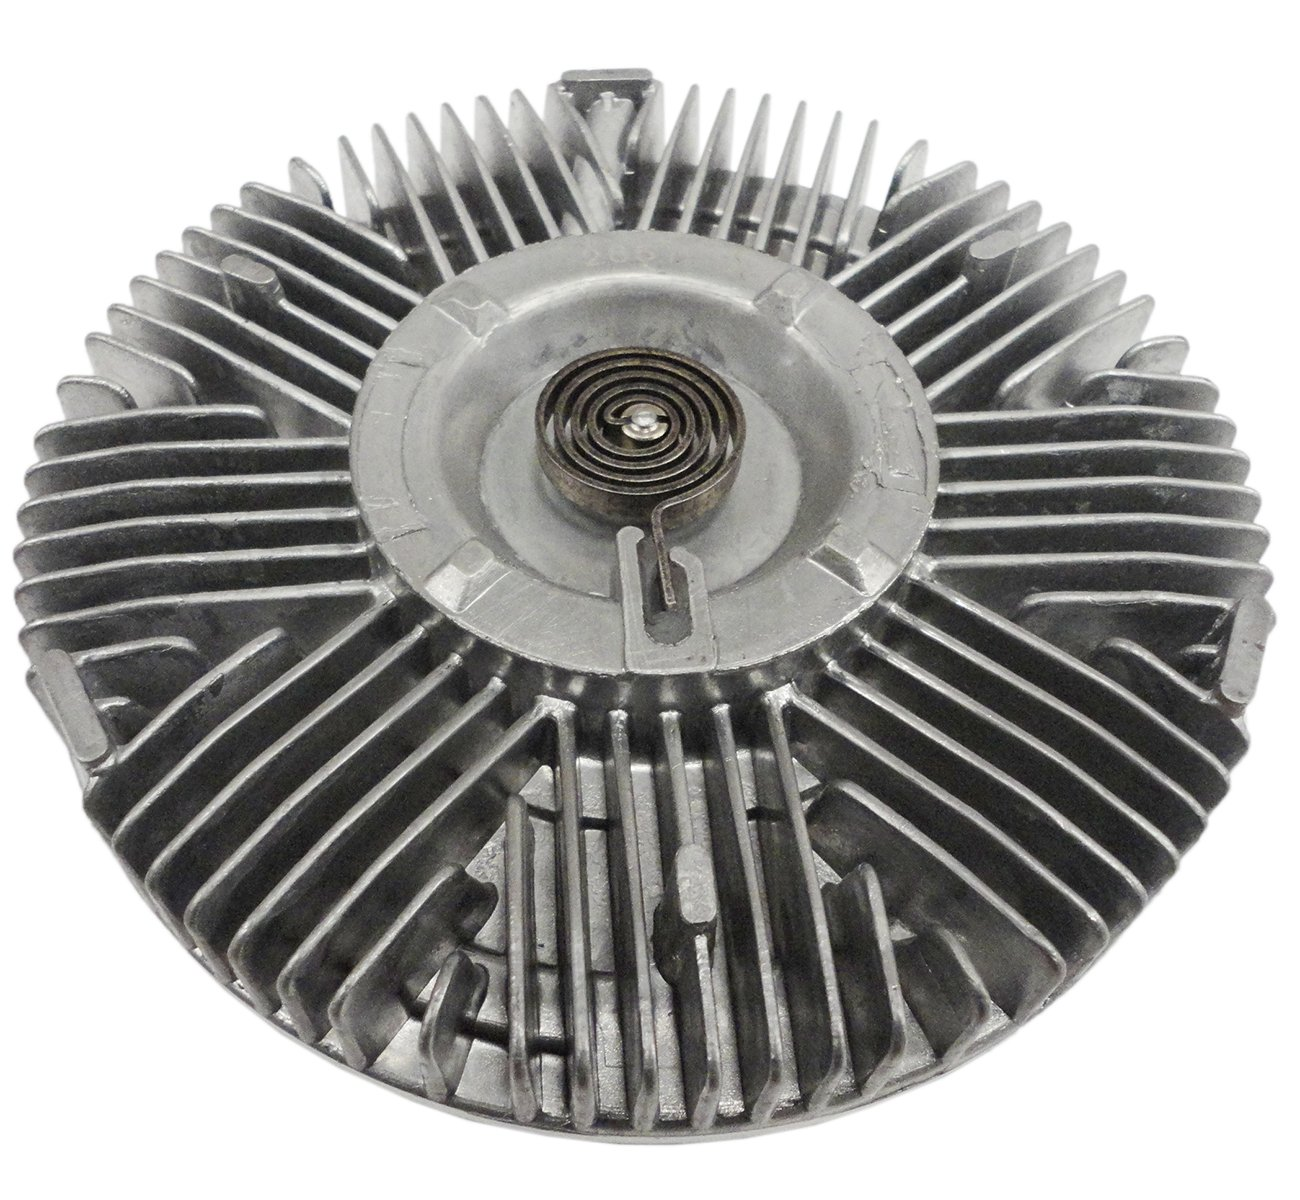 TOPAZ 2851 Engine Cooling Fan Clutch for Chevrolet Trailblazer GMC Envoy 2006-2009